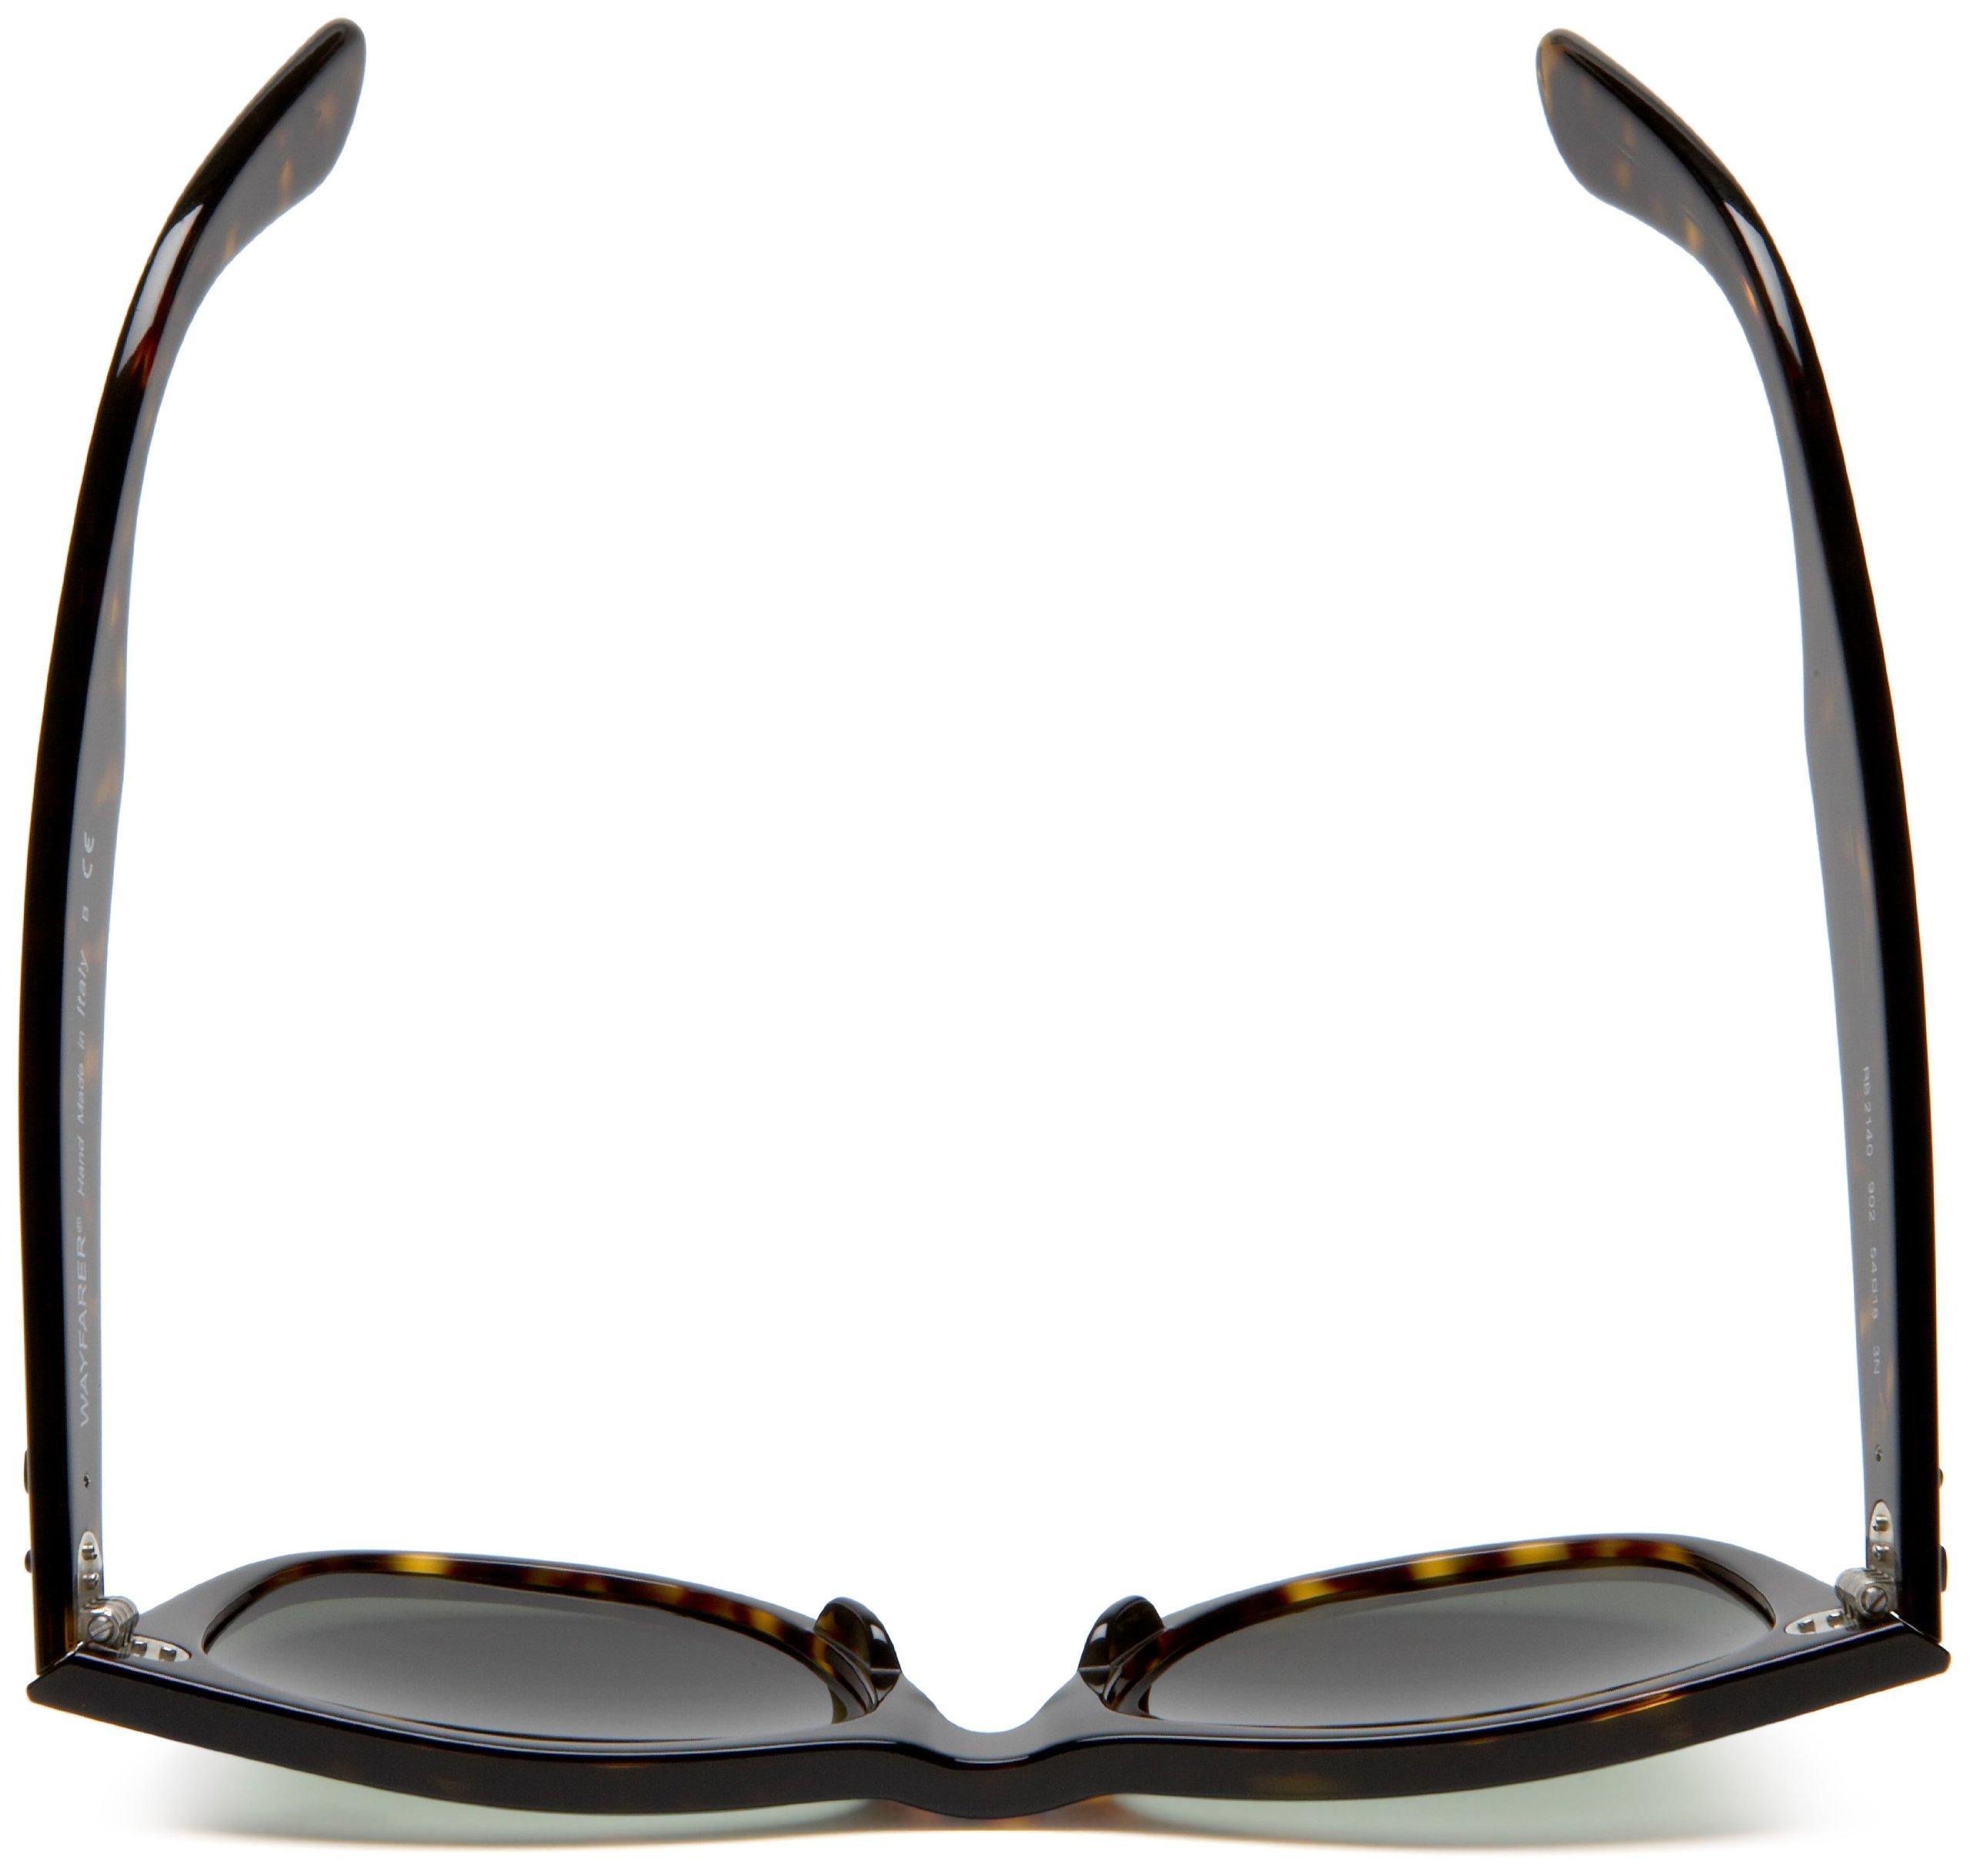 Ray-Ban, RB2140 Original Wayfarer Sunglasses, Unisex Ray-Ban Glasses, 100% UV Protection, Non-Polarized, Reduce Eye Strain, Lightweight Acetate Frame, Prescription-Ready Lenses, 54 mm Frame by Ray-Ban (Image #5)